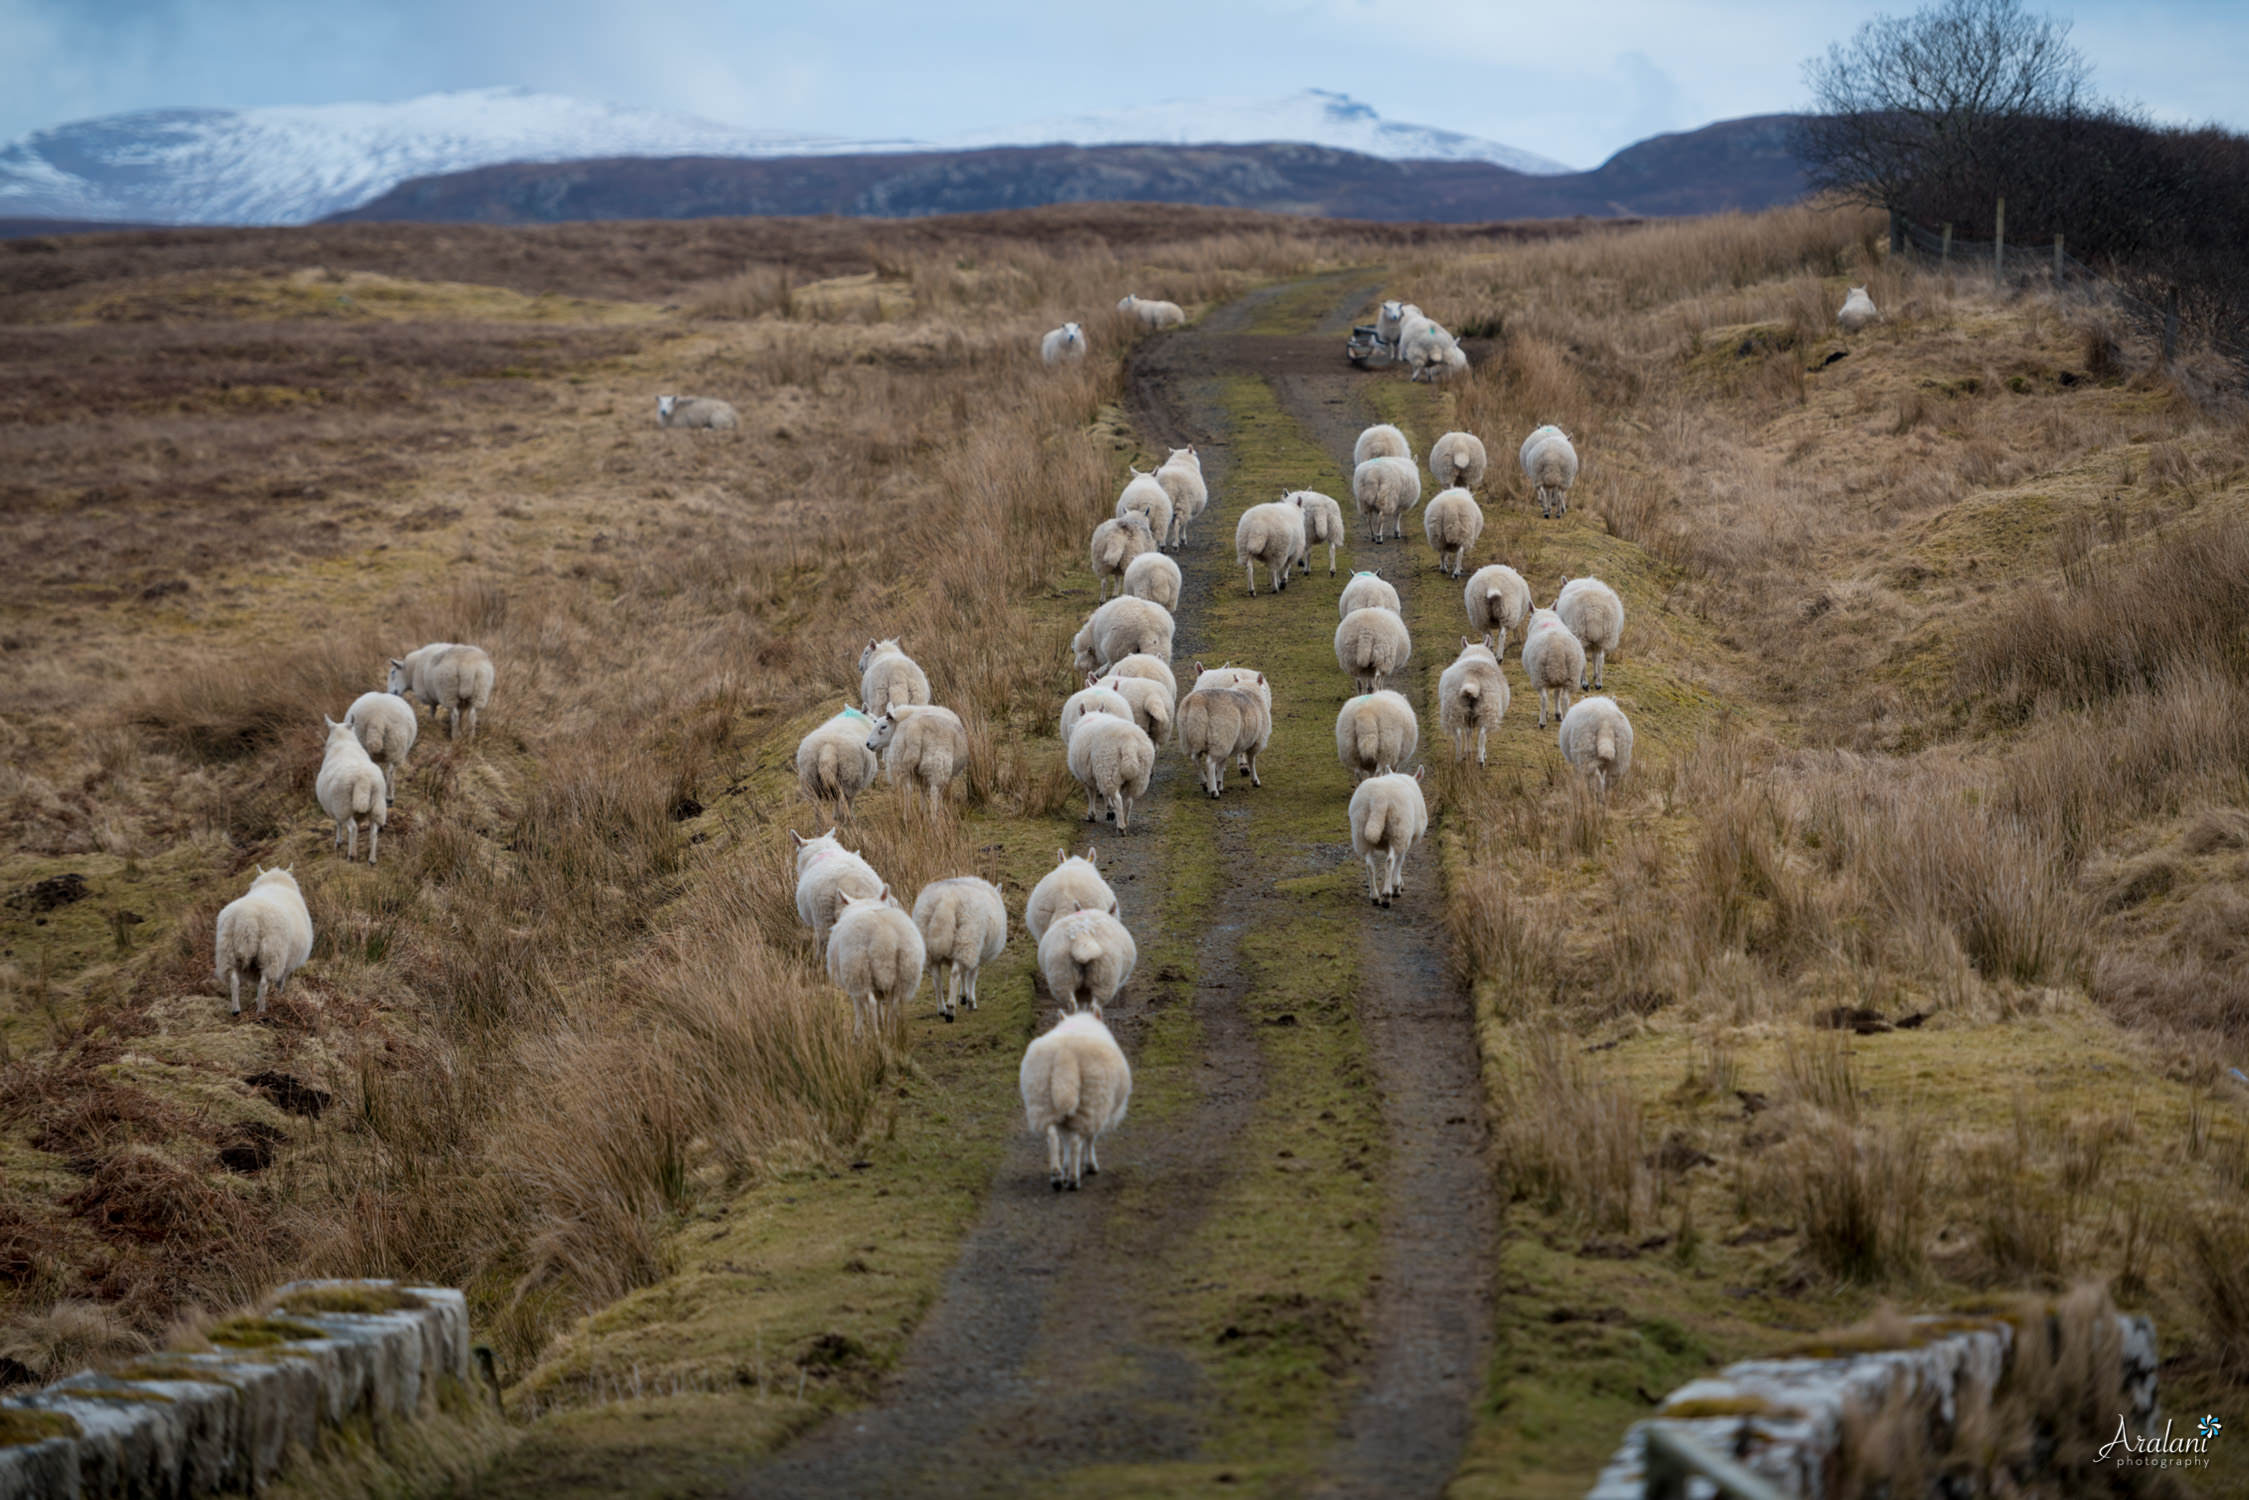 Aralani_Scotland_0019.jpg